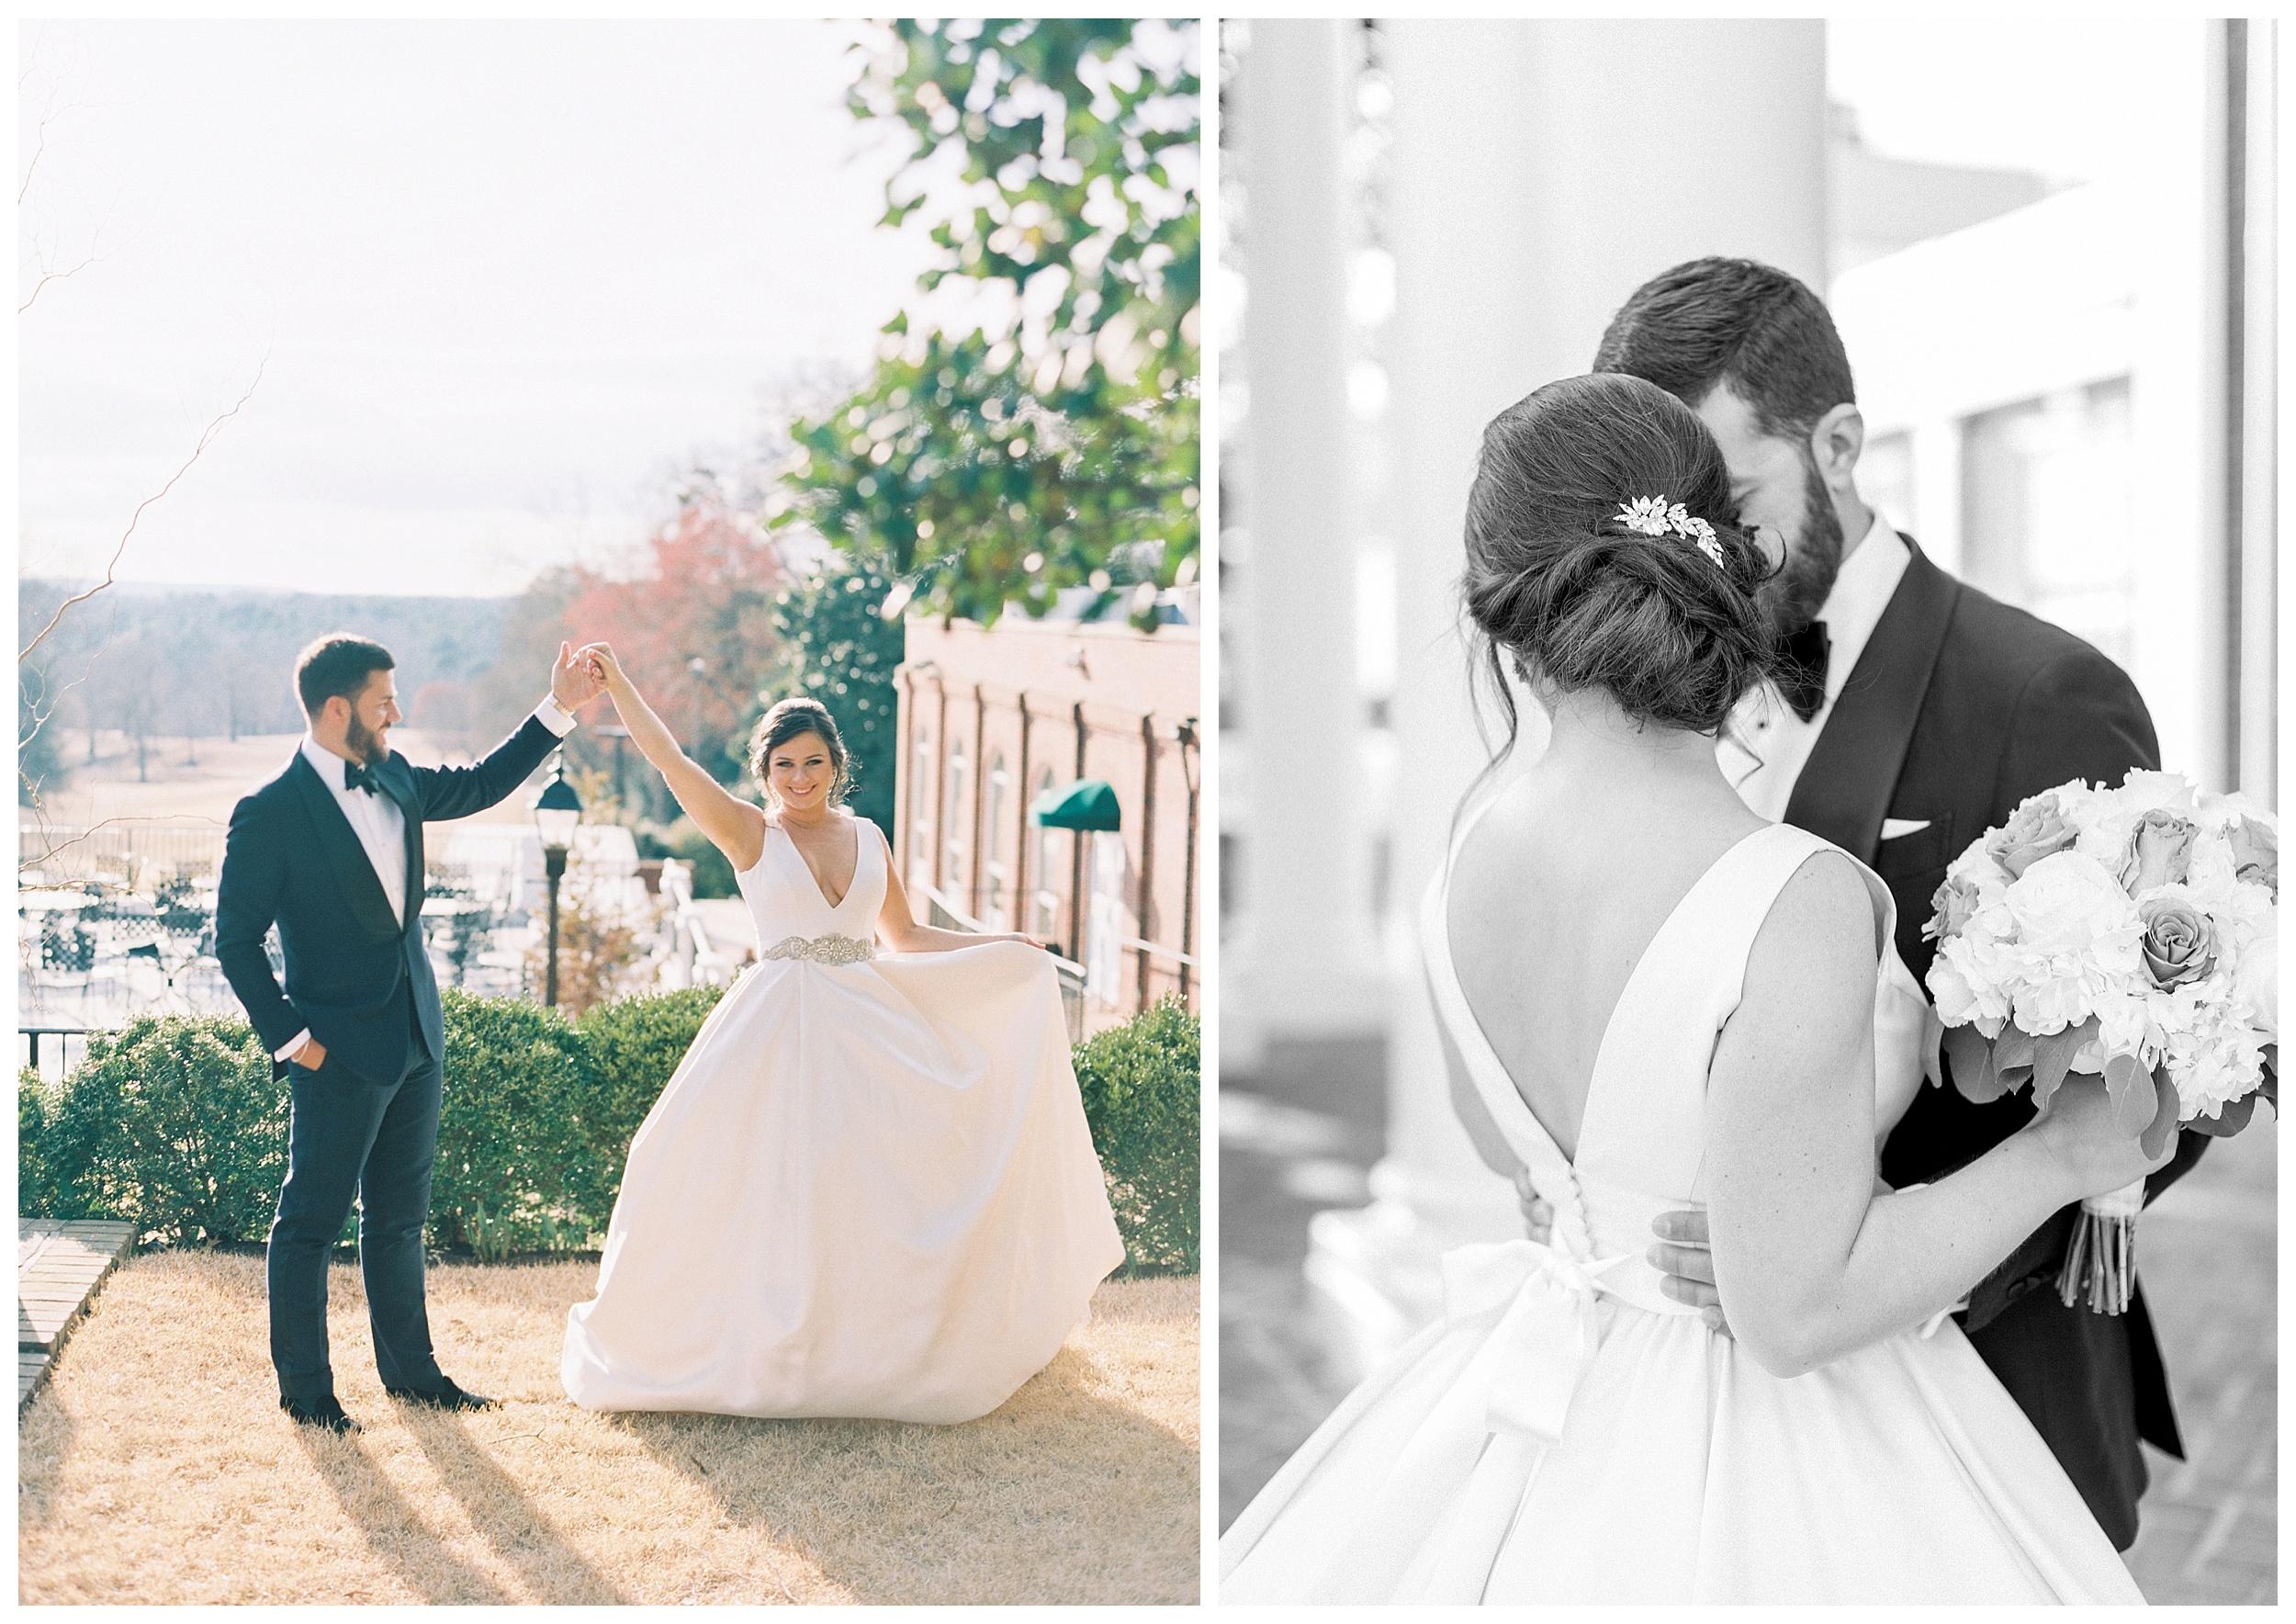 Country Club of Virginia Wedding | Richmond Wedding Photographer_0104.jpg